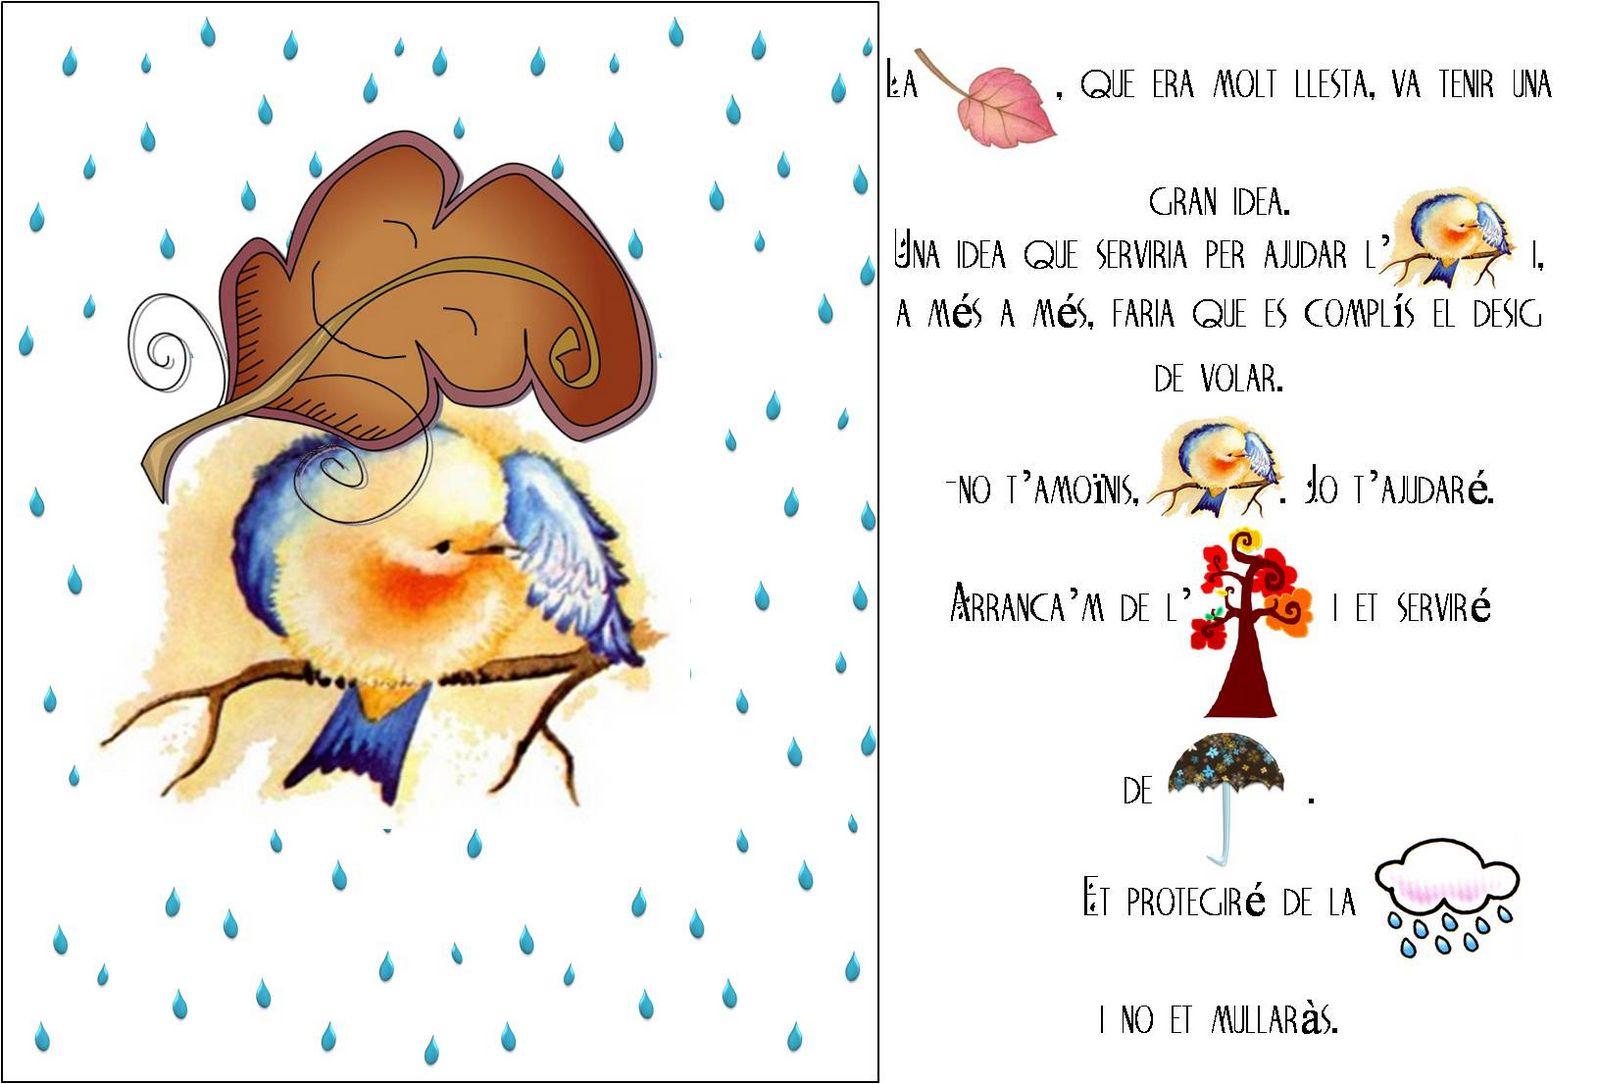 Photo: http://quehacemoshoyenelcole.blogspot.com/